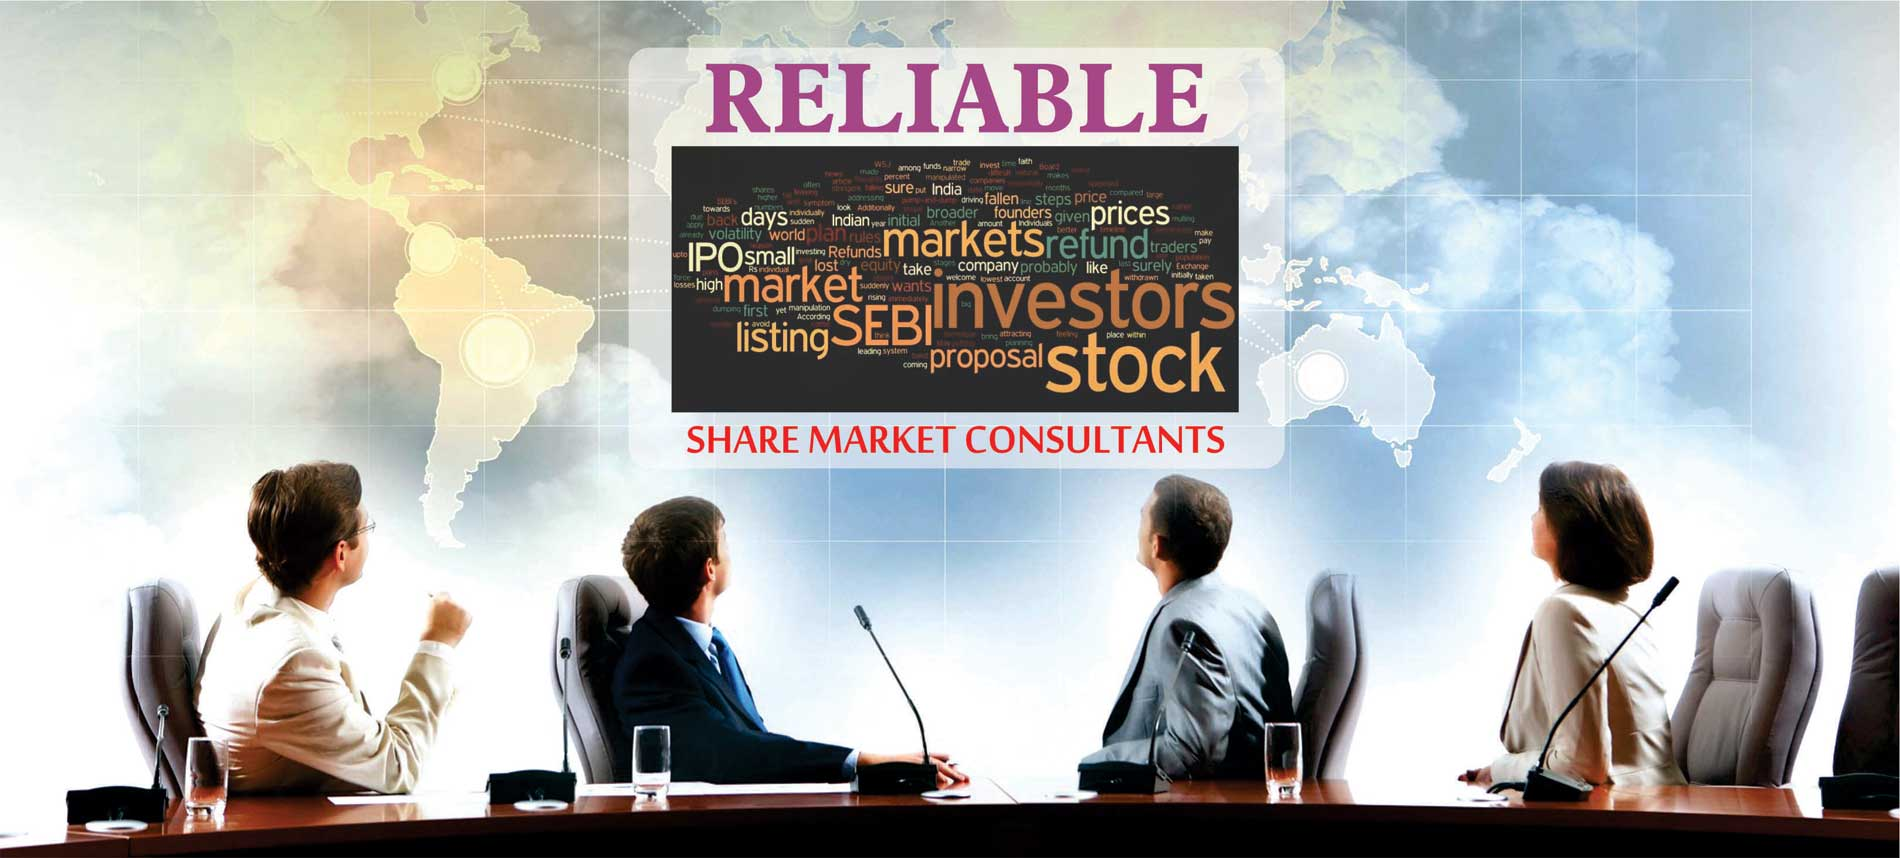 Share Market Consultants